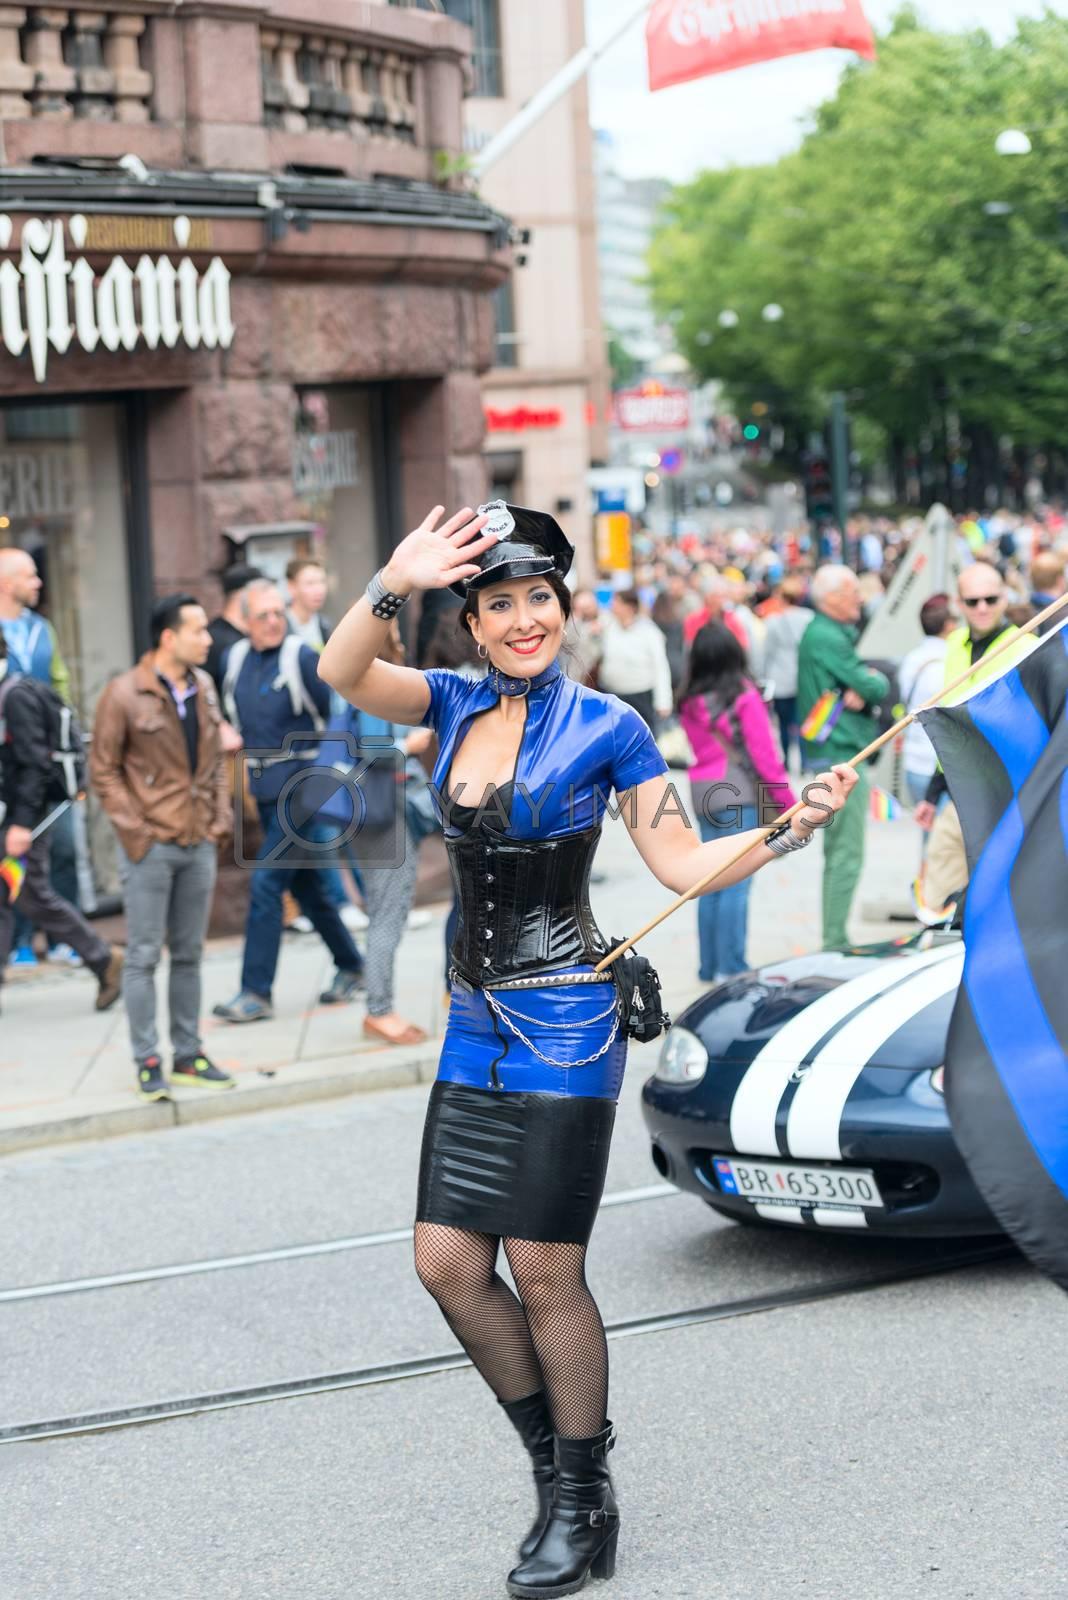 Royalty free image of Europride parade in Oslo policewoman by Nanisimova